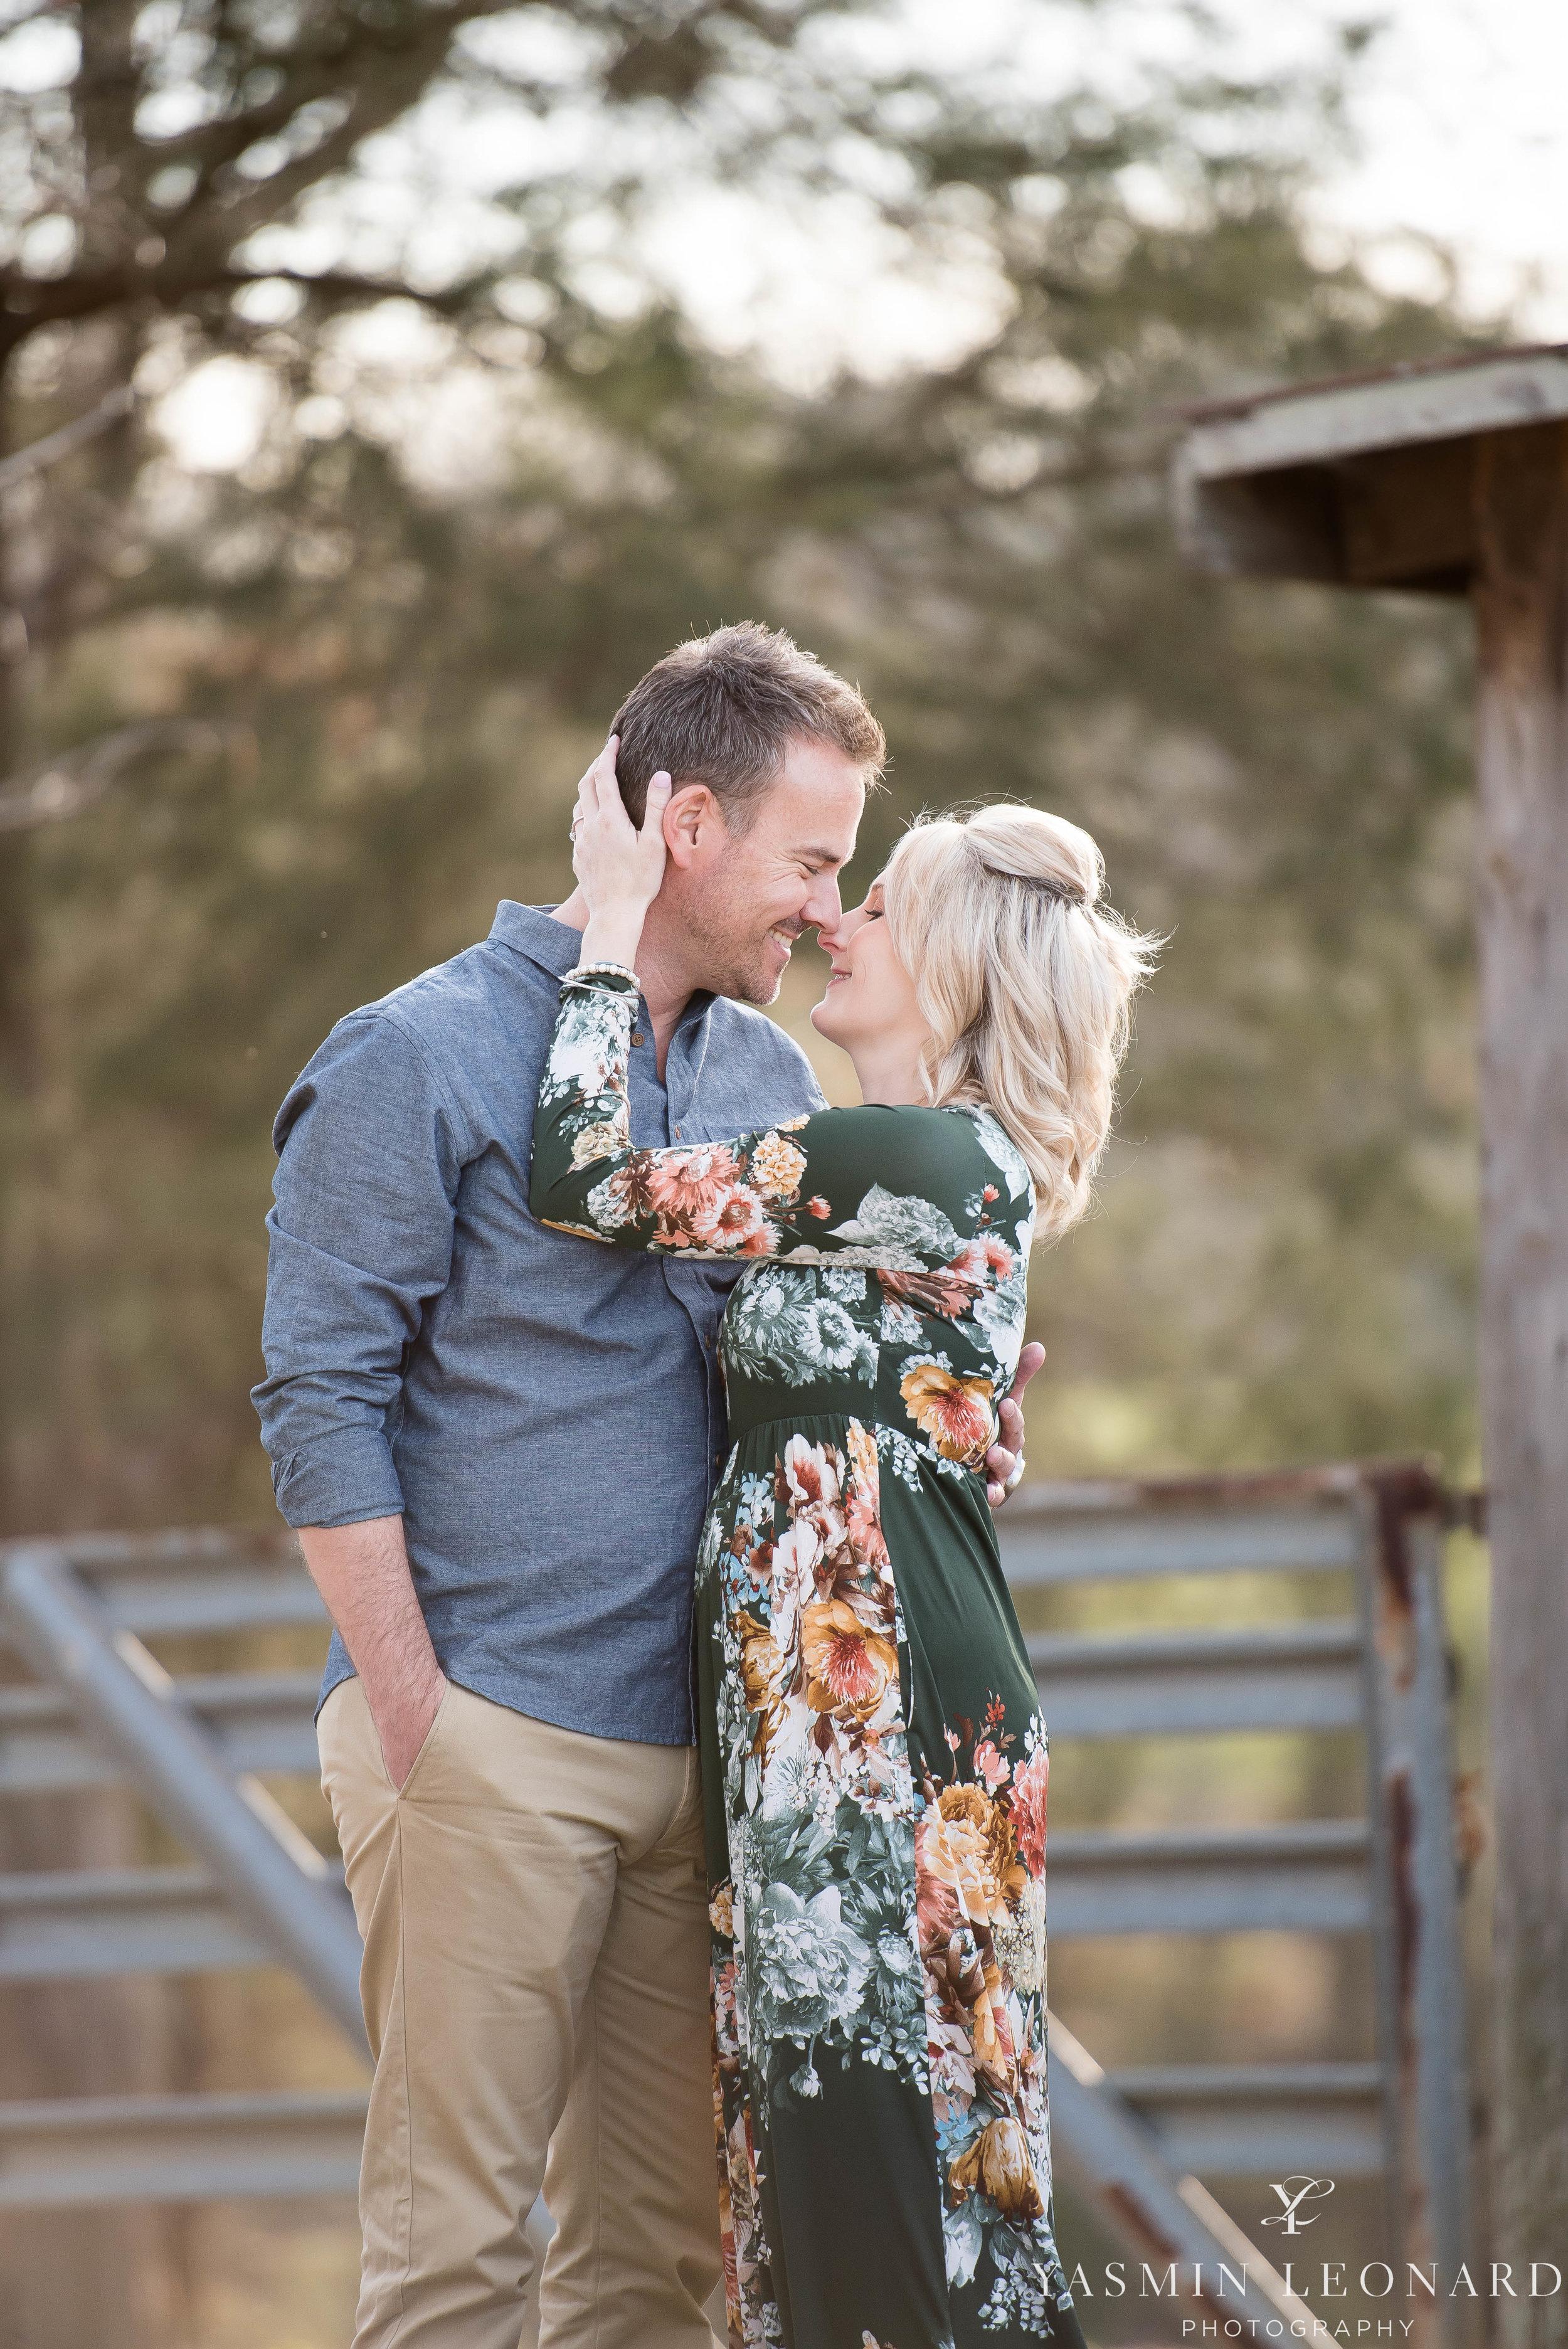 High Point Wedding Photographer - NC Wedding Photographer - Yasmin Leonard Photography - Engagement Poses - Engagement Ideas - Outdoor Engagement Session-13.jpg